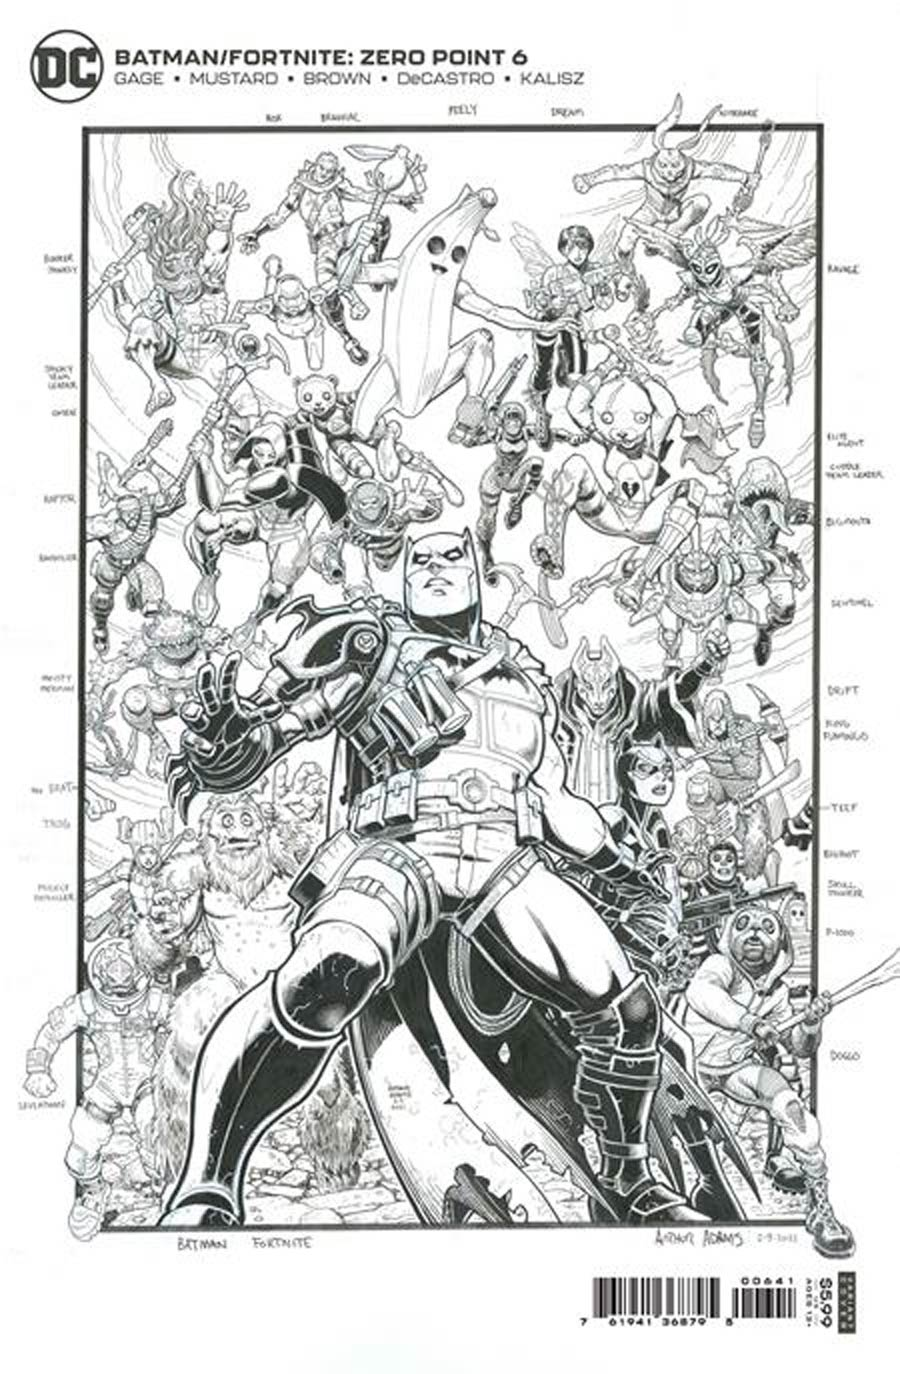 Batman Fortnite Zero Point #6 Premium Variant Incentive Arthur Adams Compilation Card Stock Cover